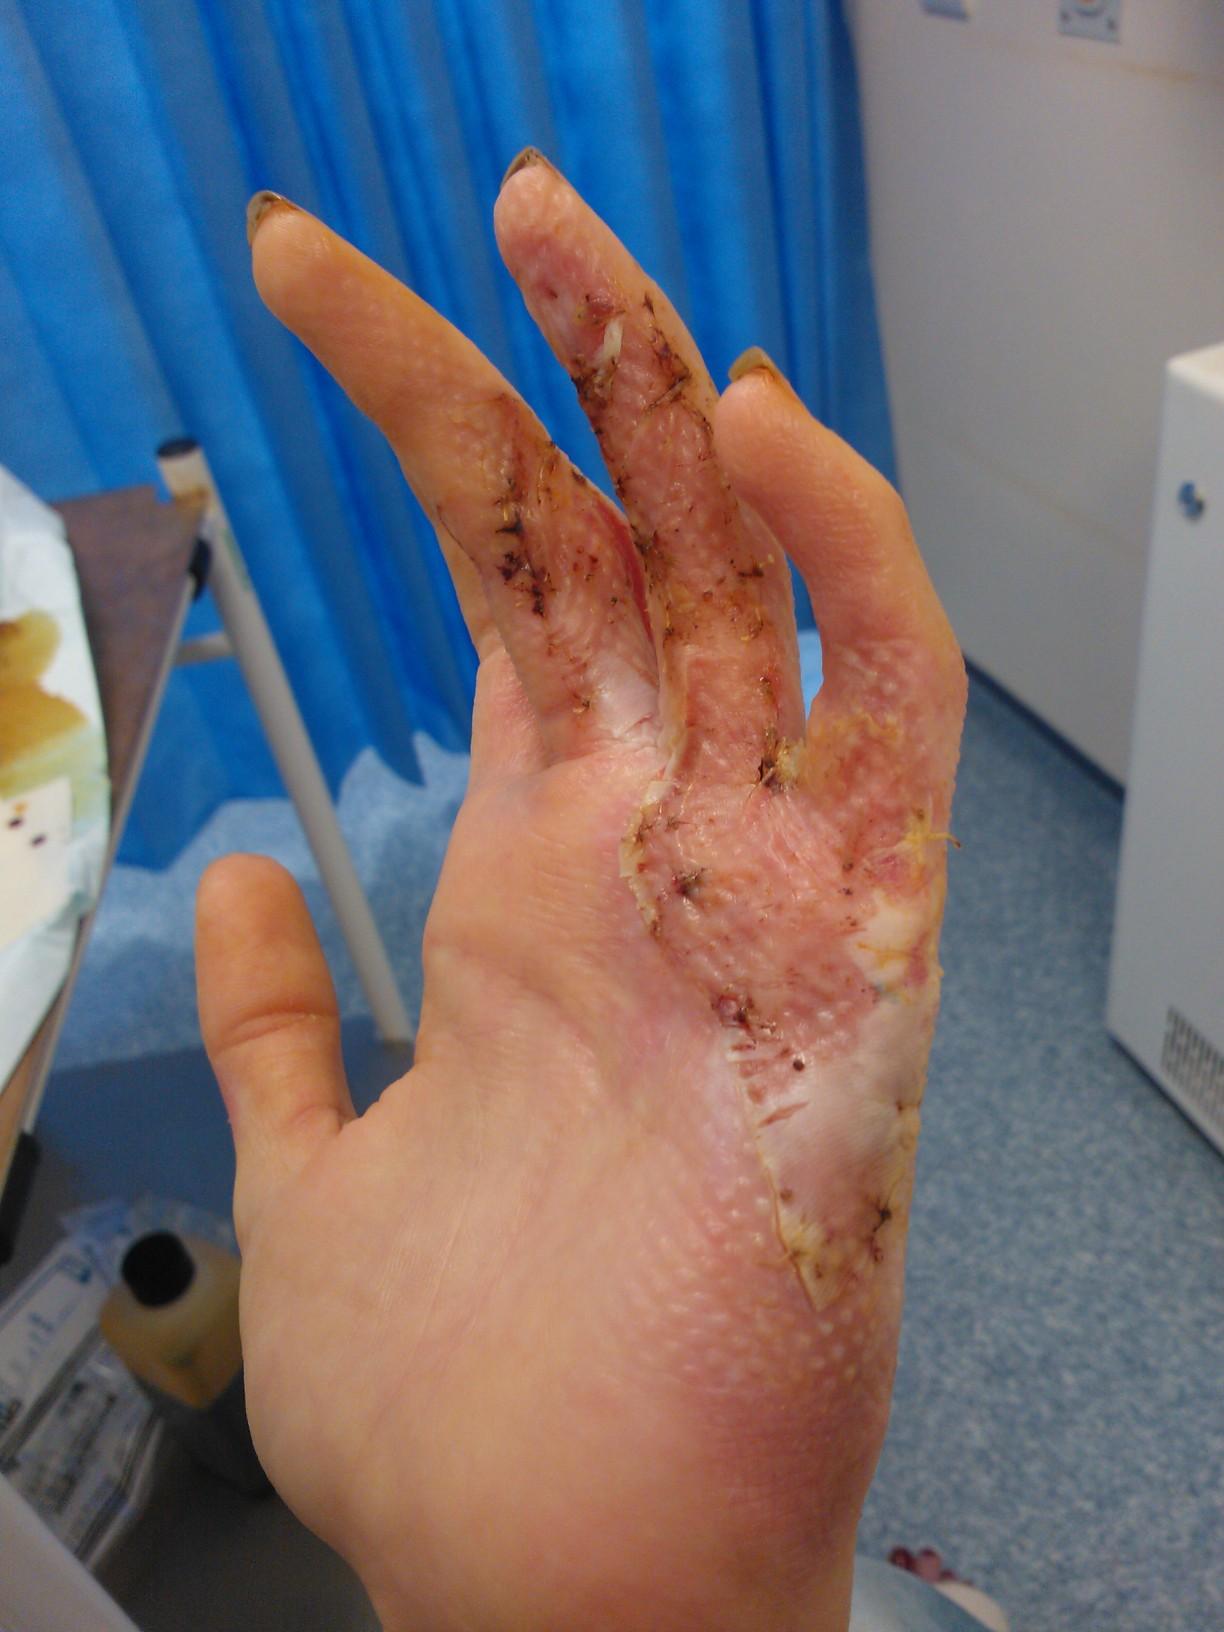 Dissolvable Stitches Infection